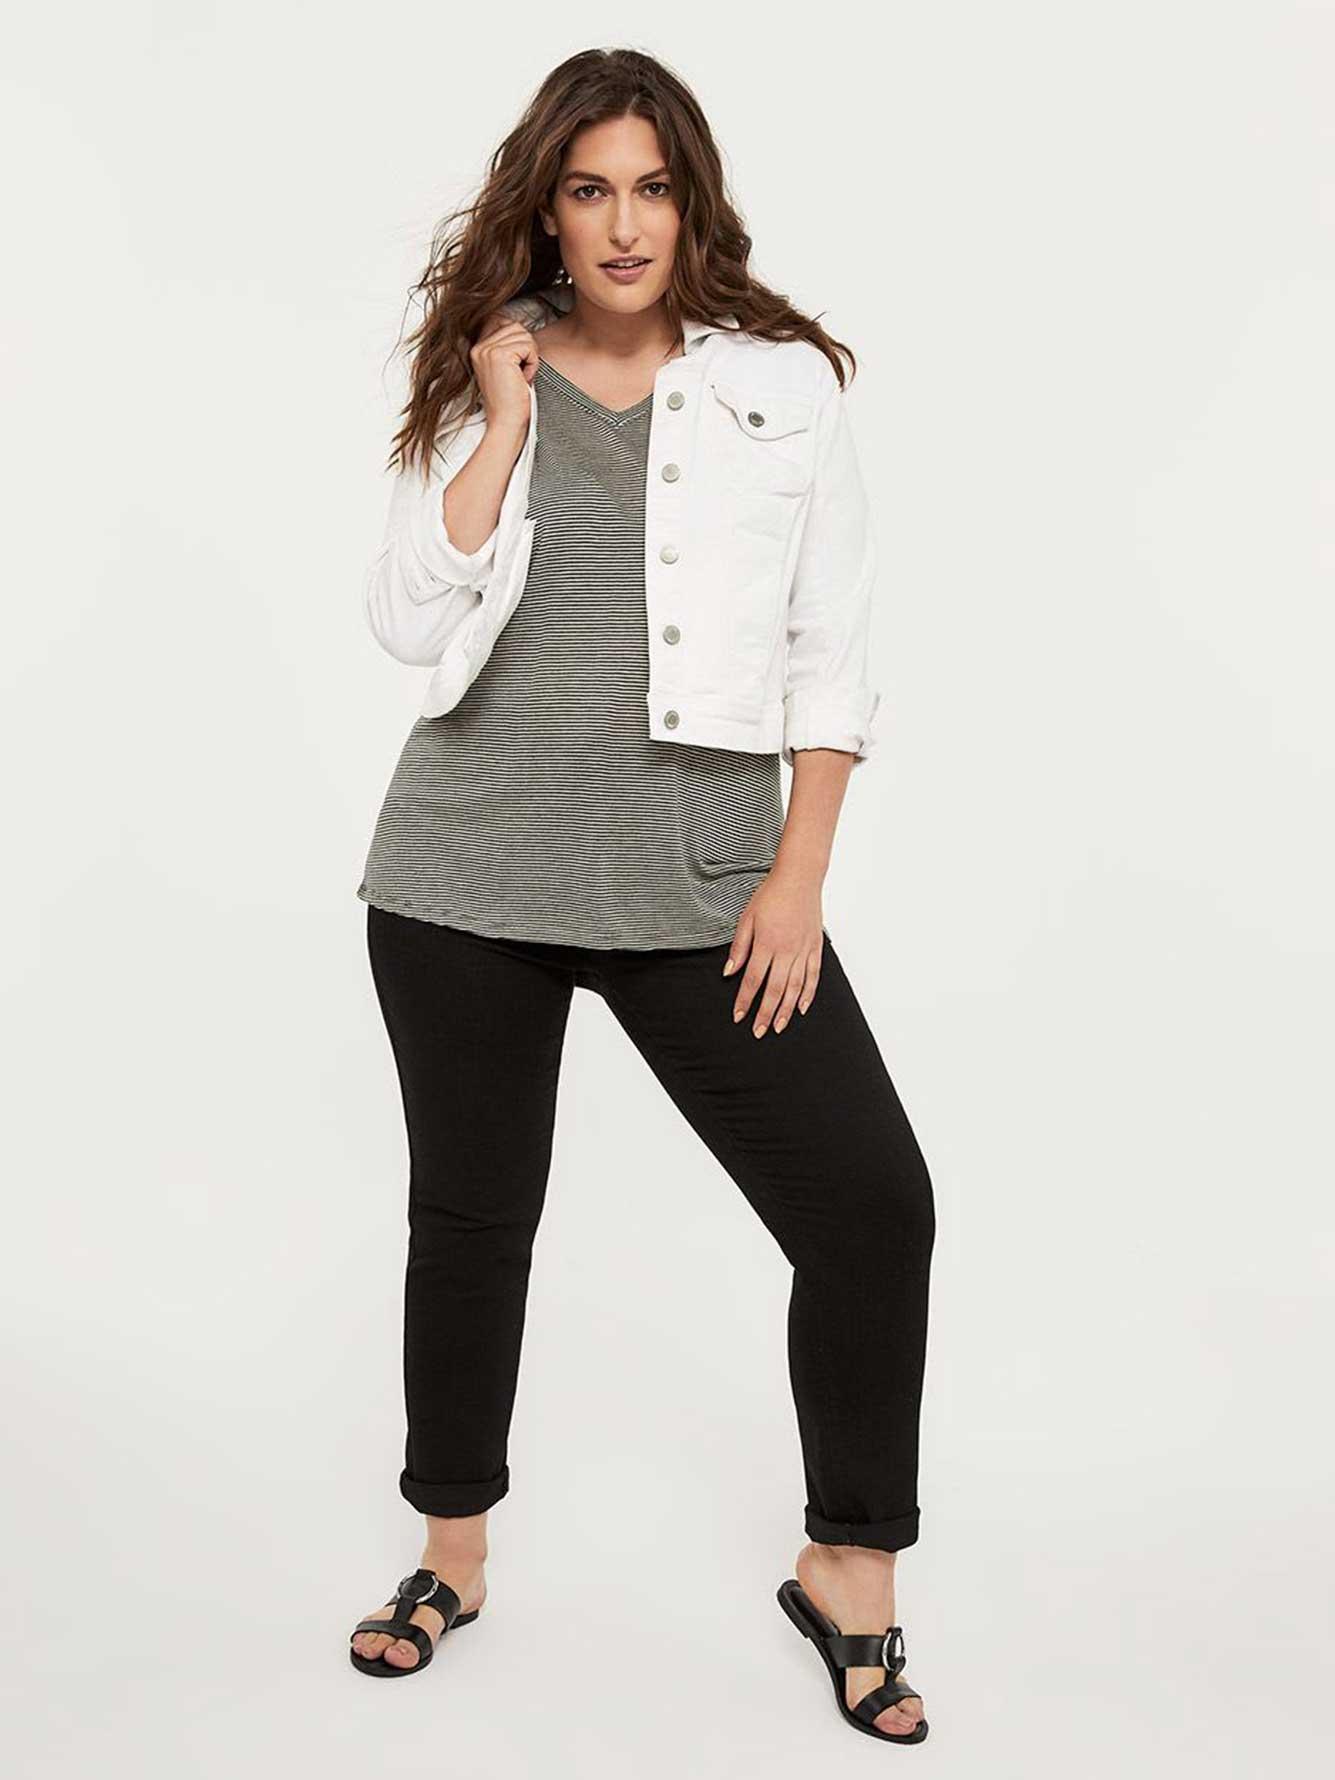 56d9154d645a66 ONLINE ONLY - Tall Curvy Fit Straight Leg Black Jean - d/C JEANS ...